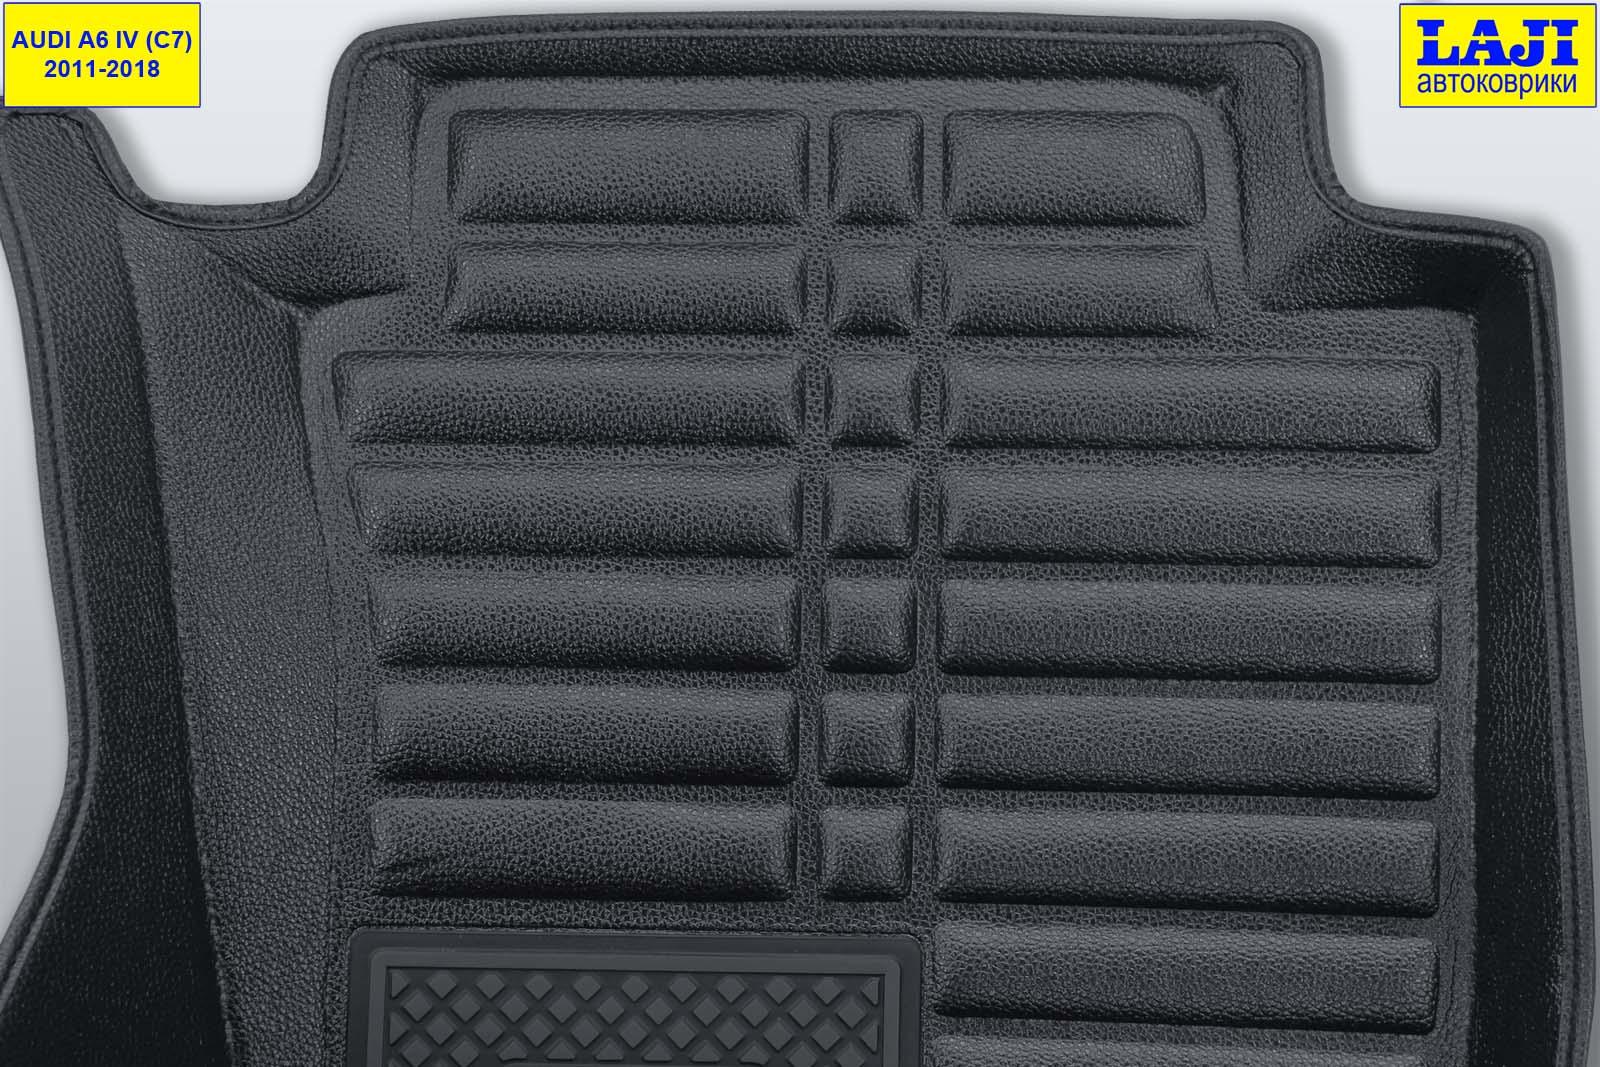 5D коврики для Audi A6 C7 2011-2018 8